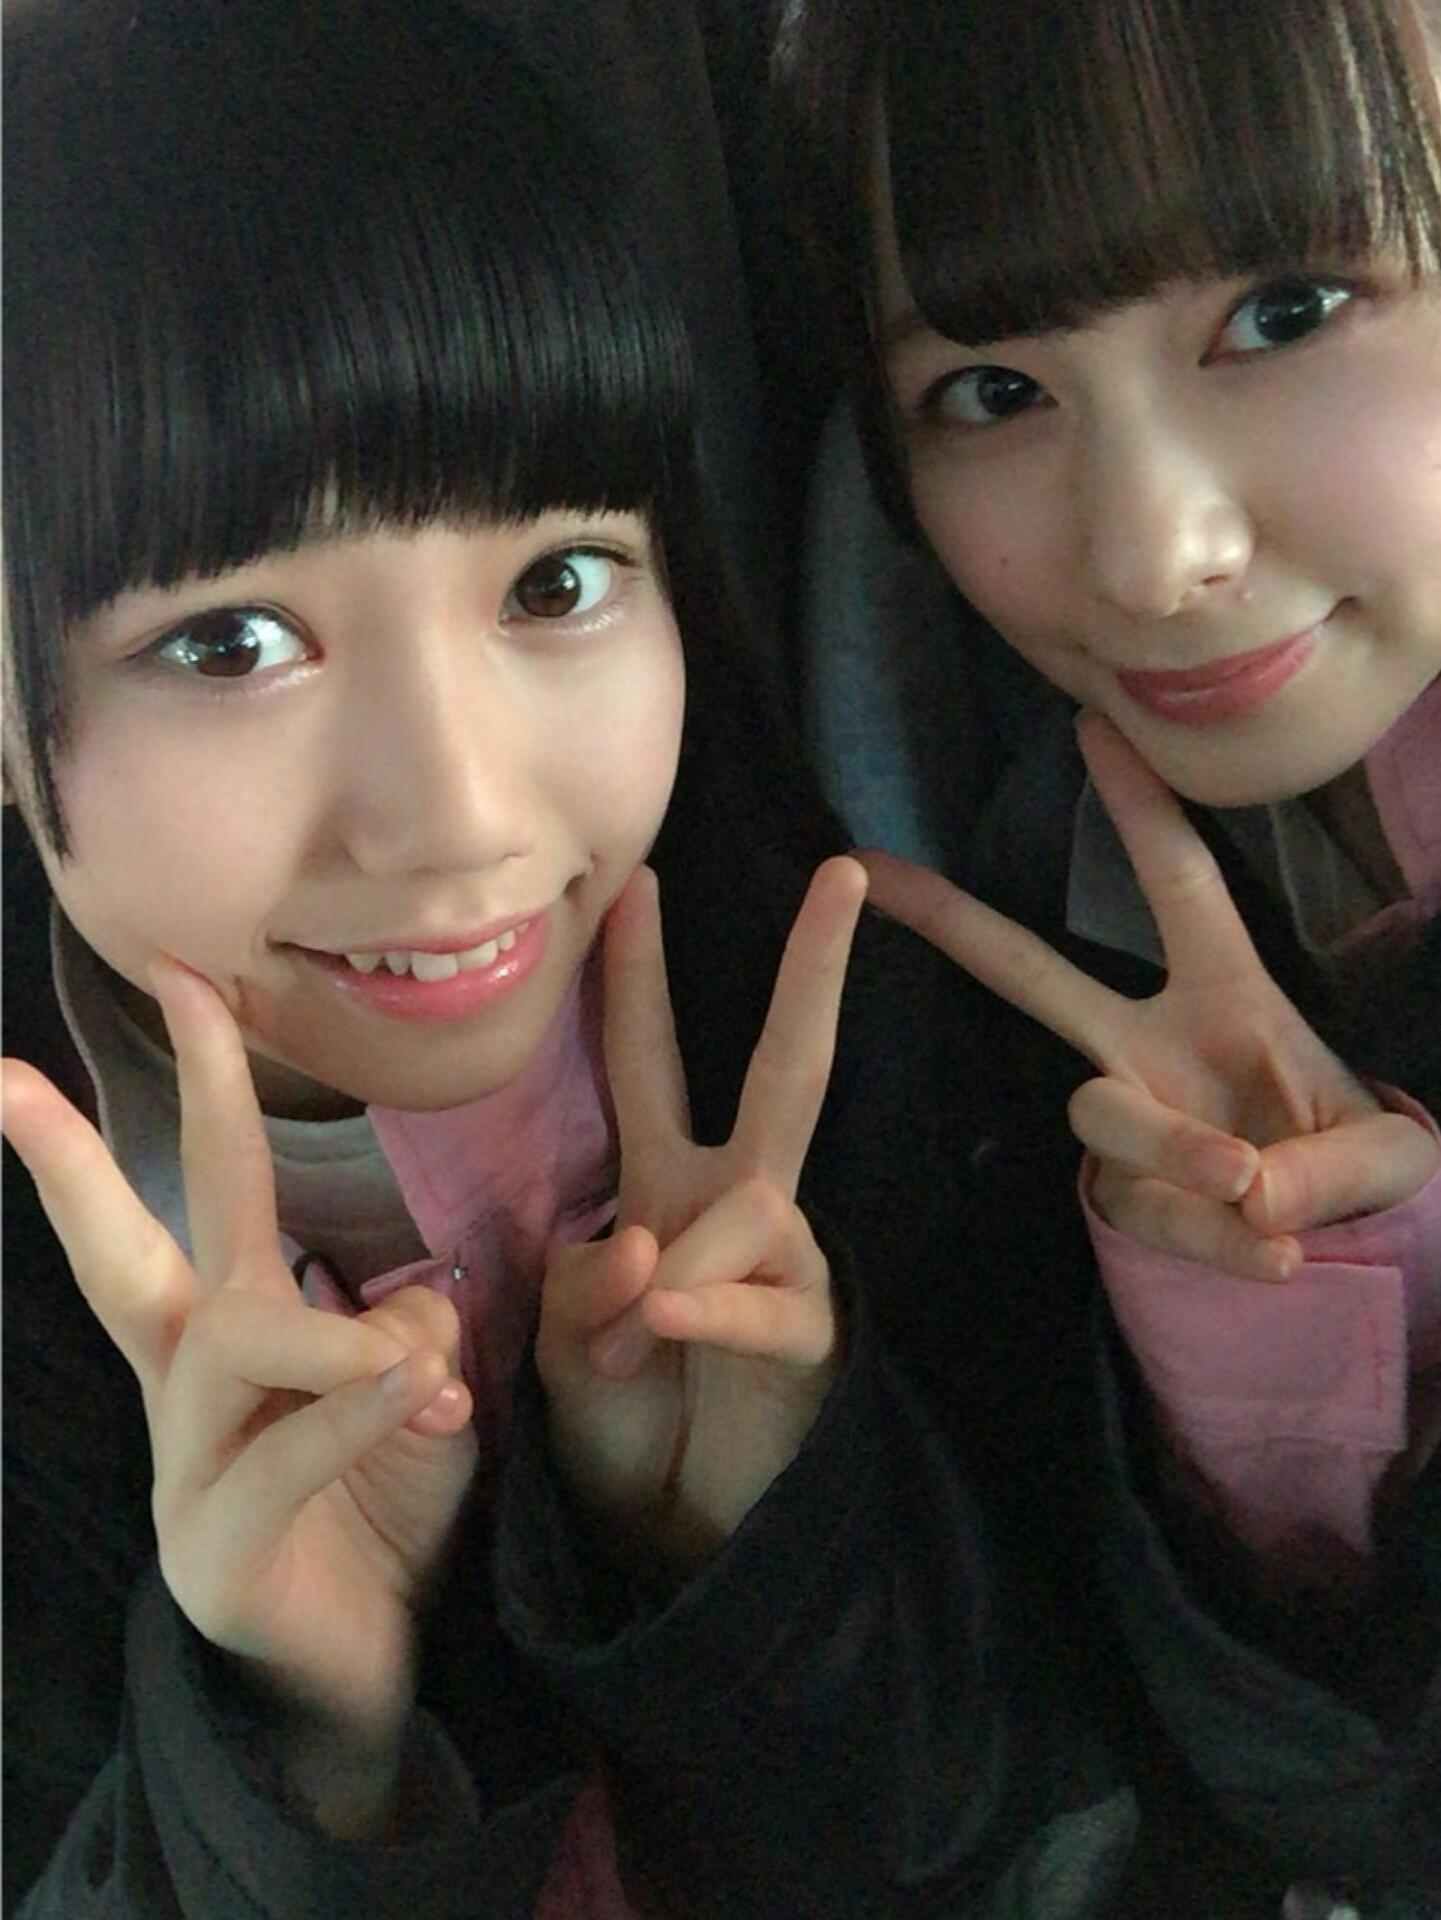 【AKB48チーム8】北玲名応援スレ☆1.1【れなな/石川県】©2ch.netYouTube動画>117本 ->画像>904枚